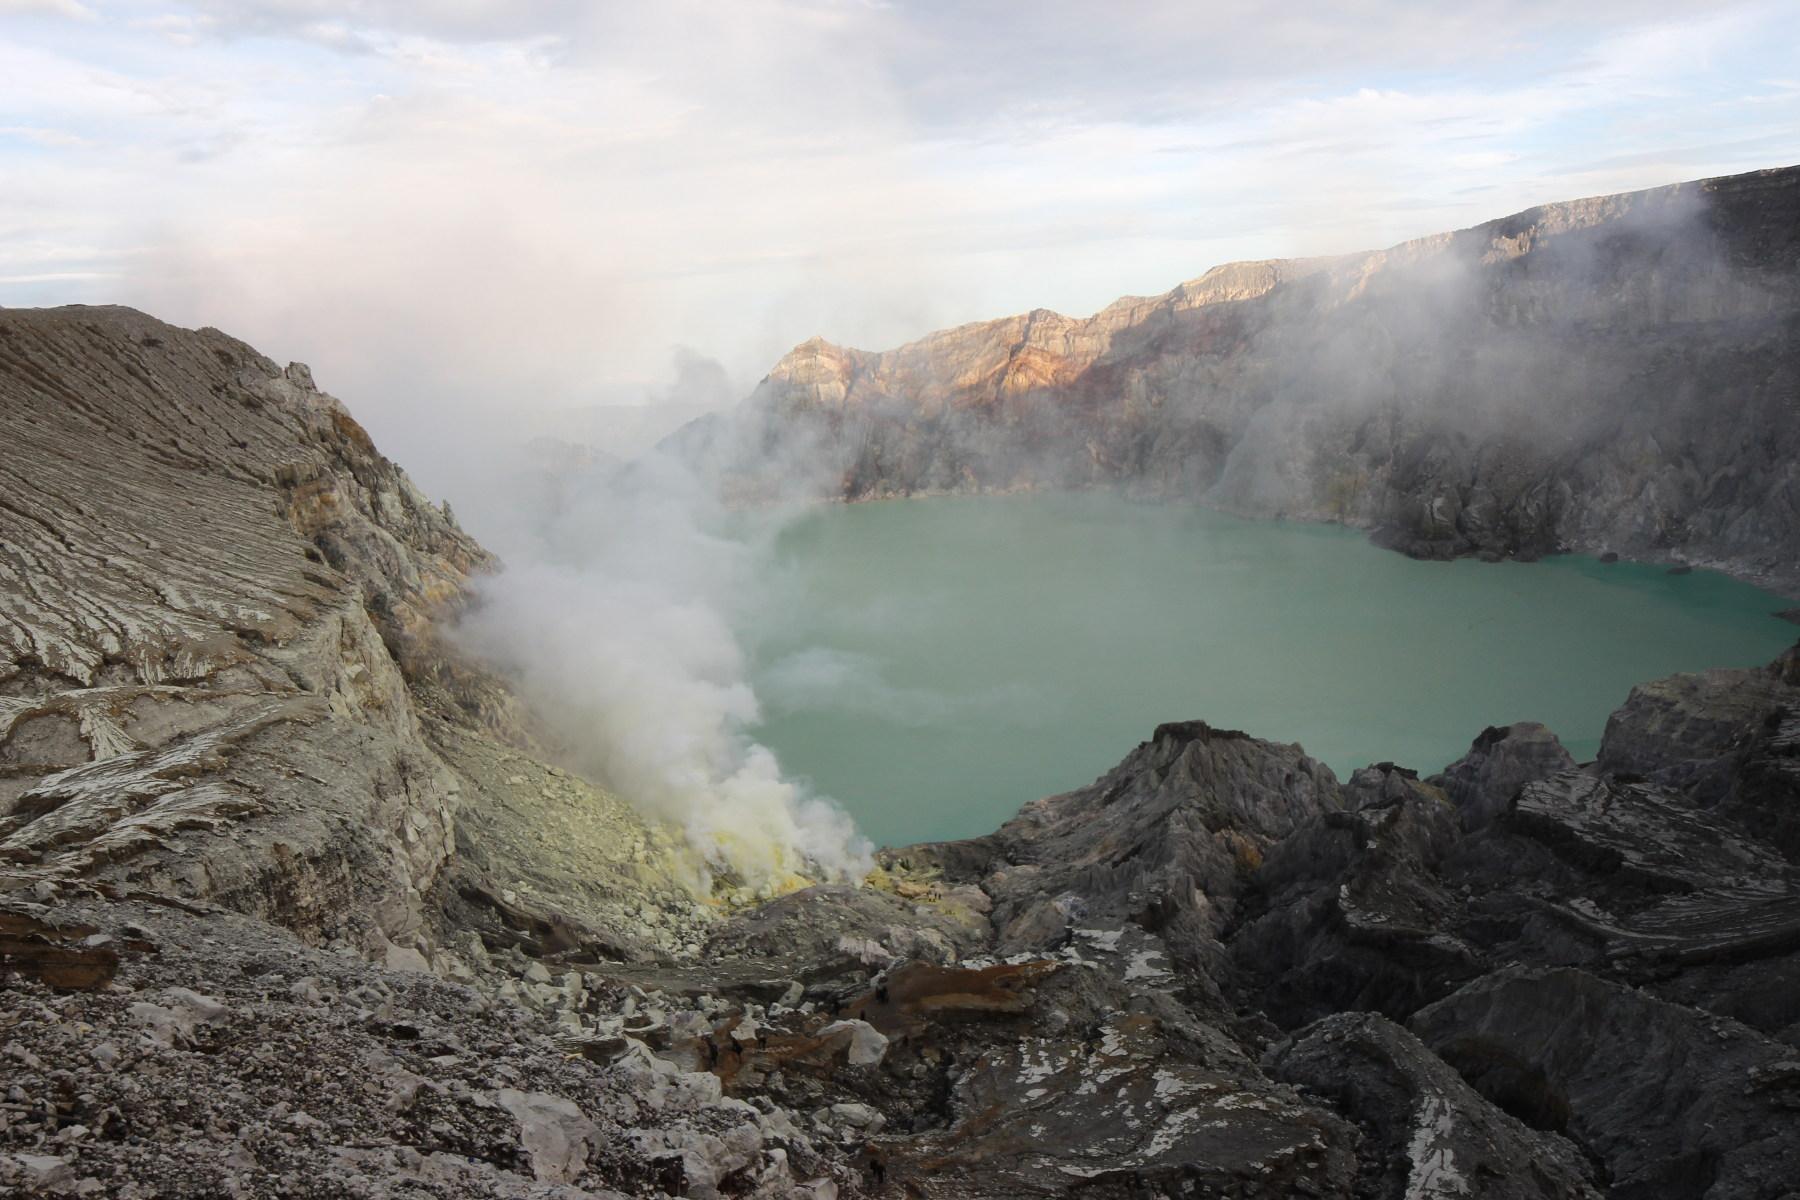 The Ijen lake